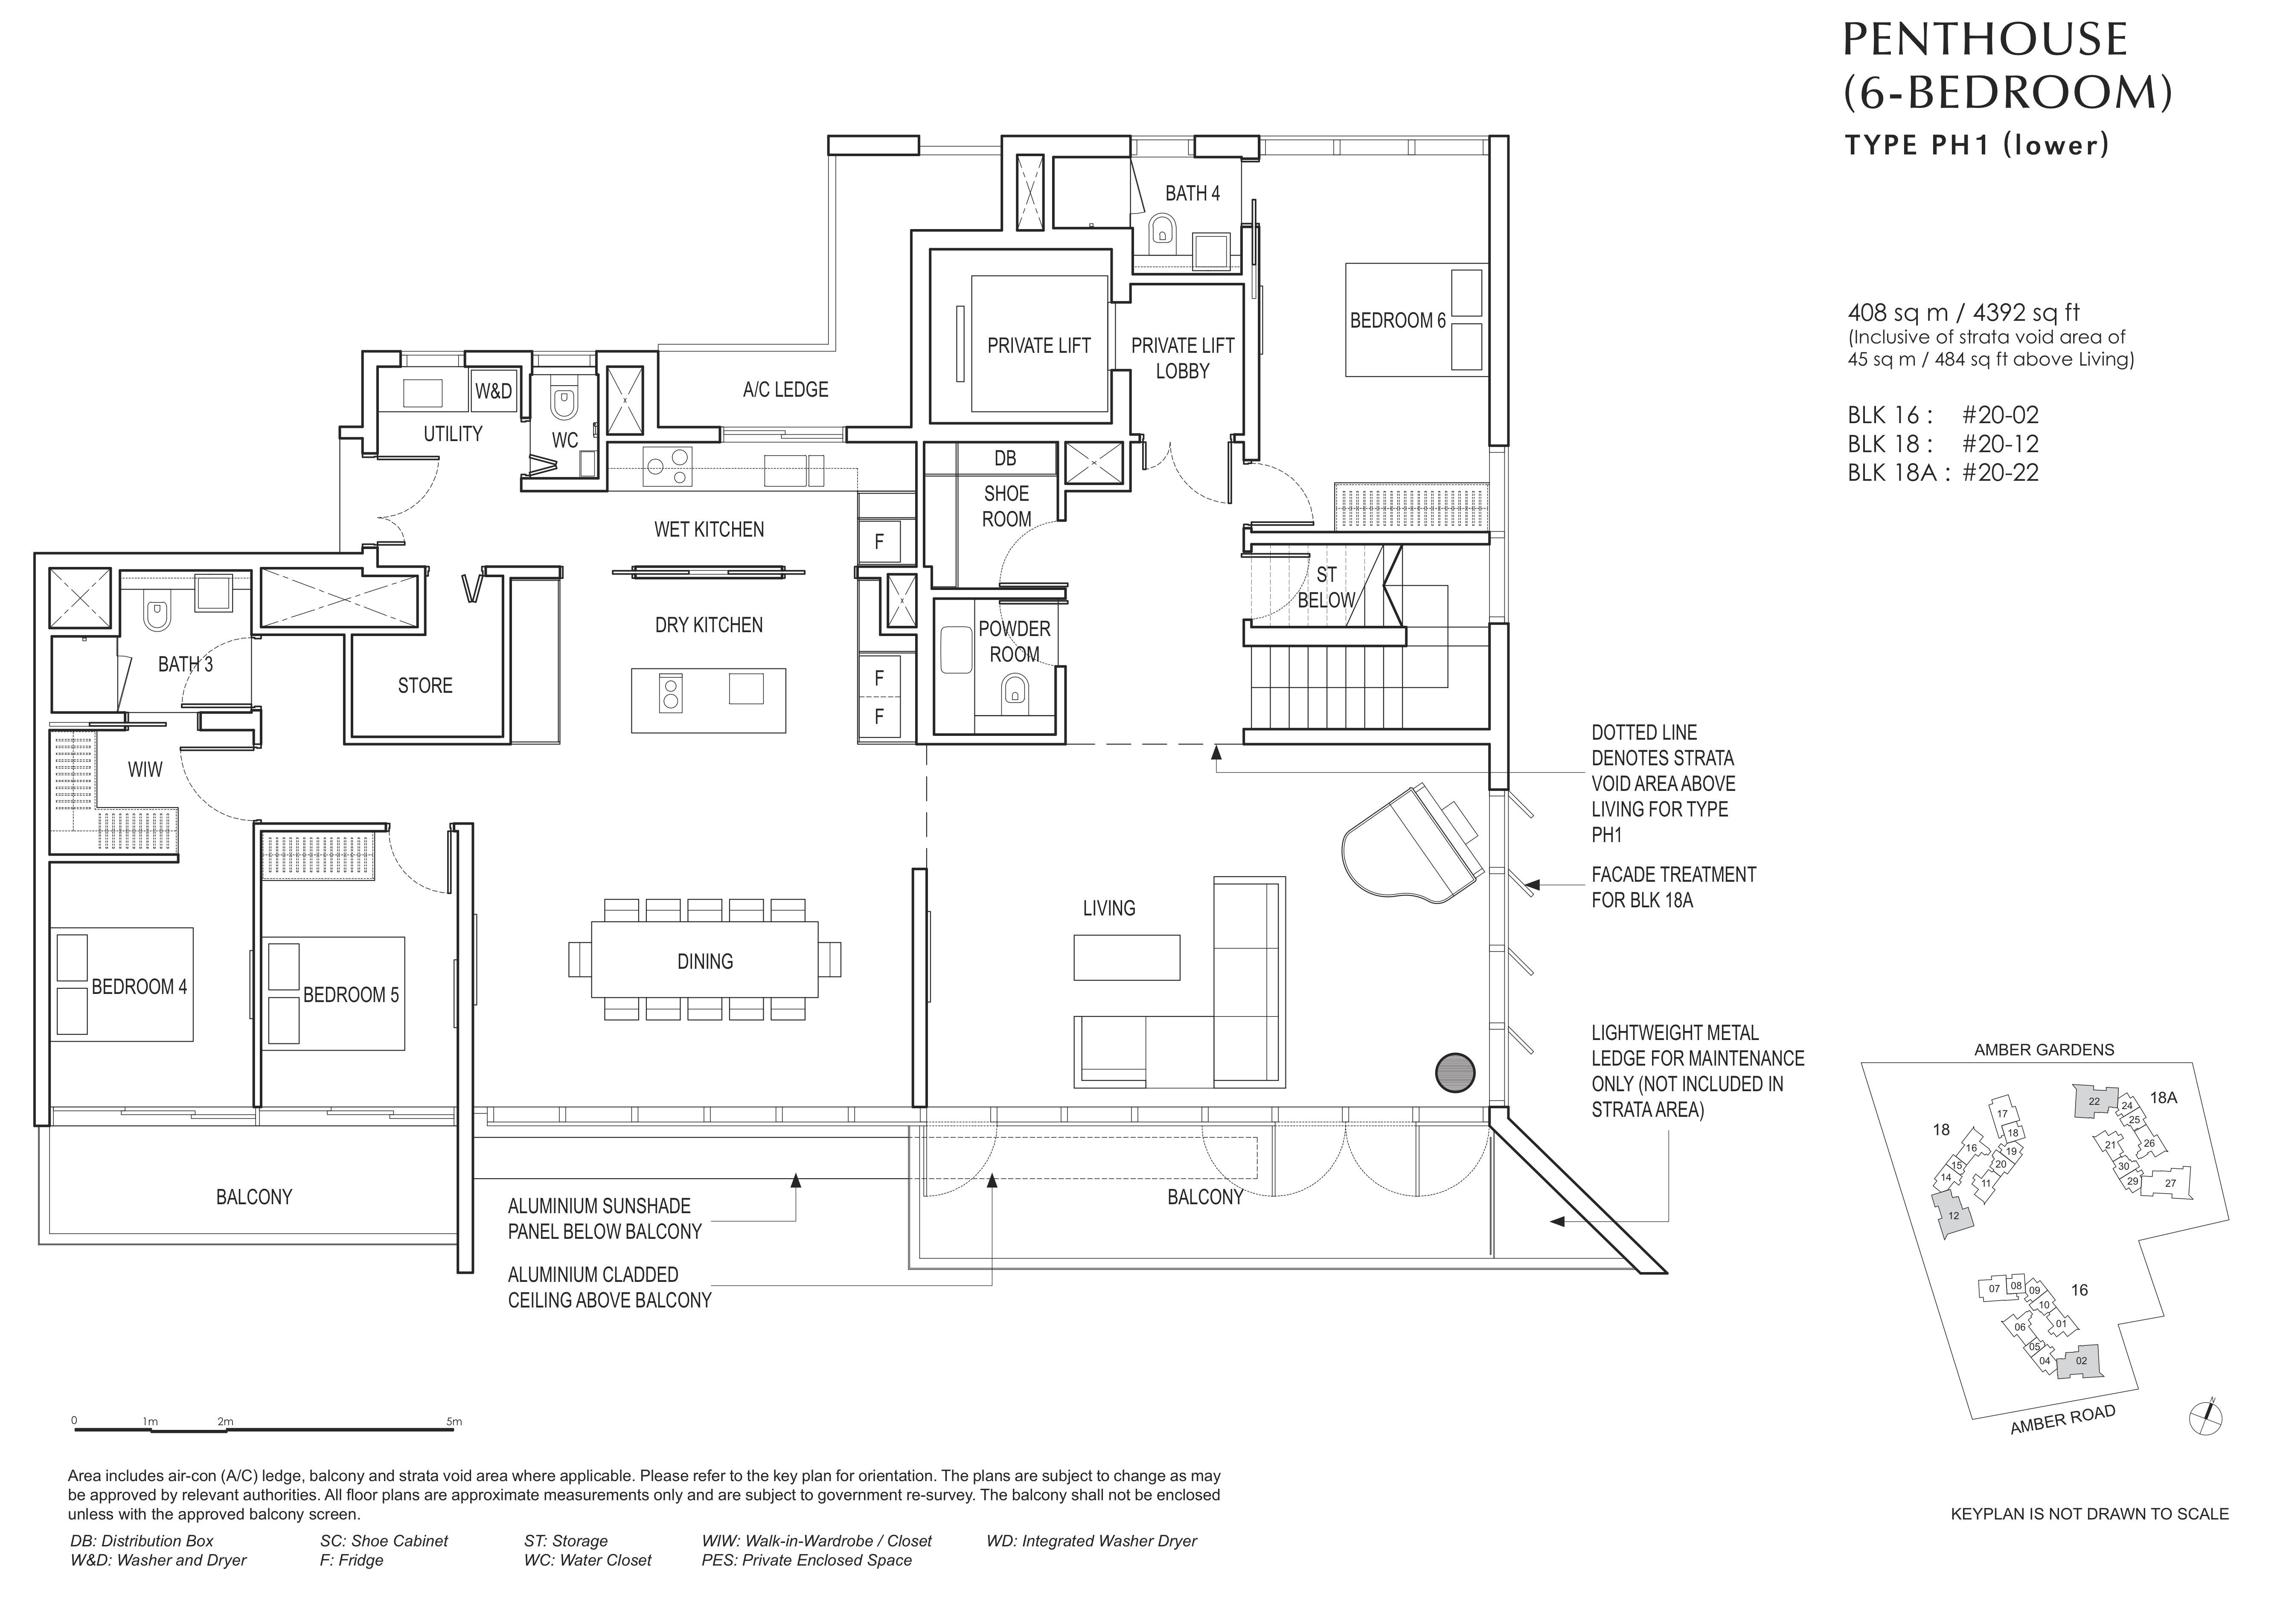 Amber Park 安铂苑 floor plan 6 bedroom penthouse 6卧房复式顶层ph1 lower